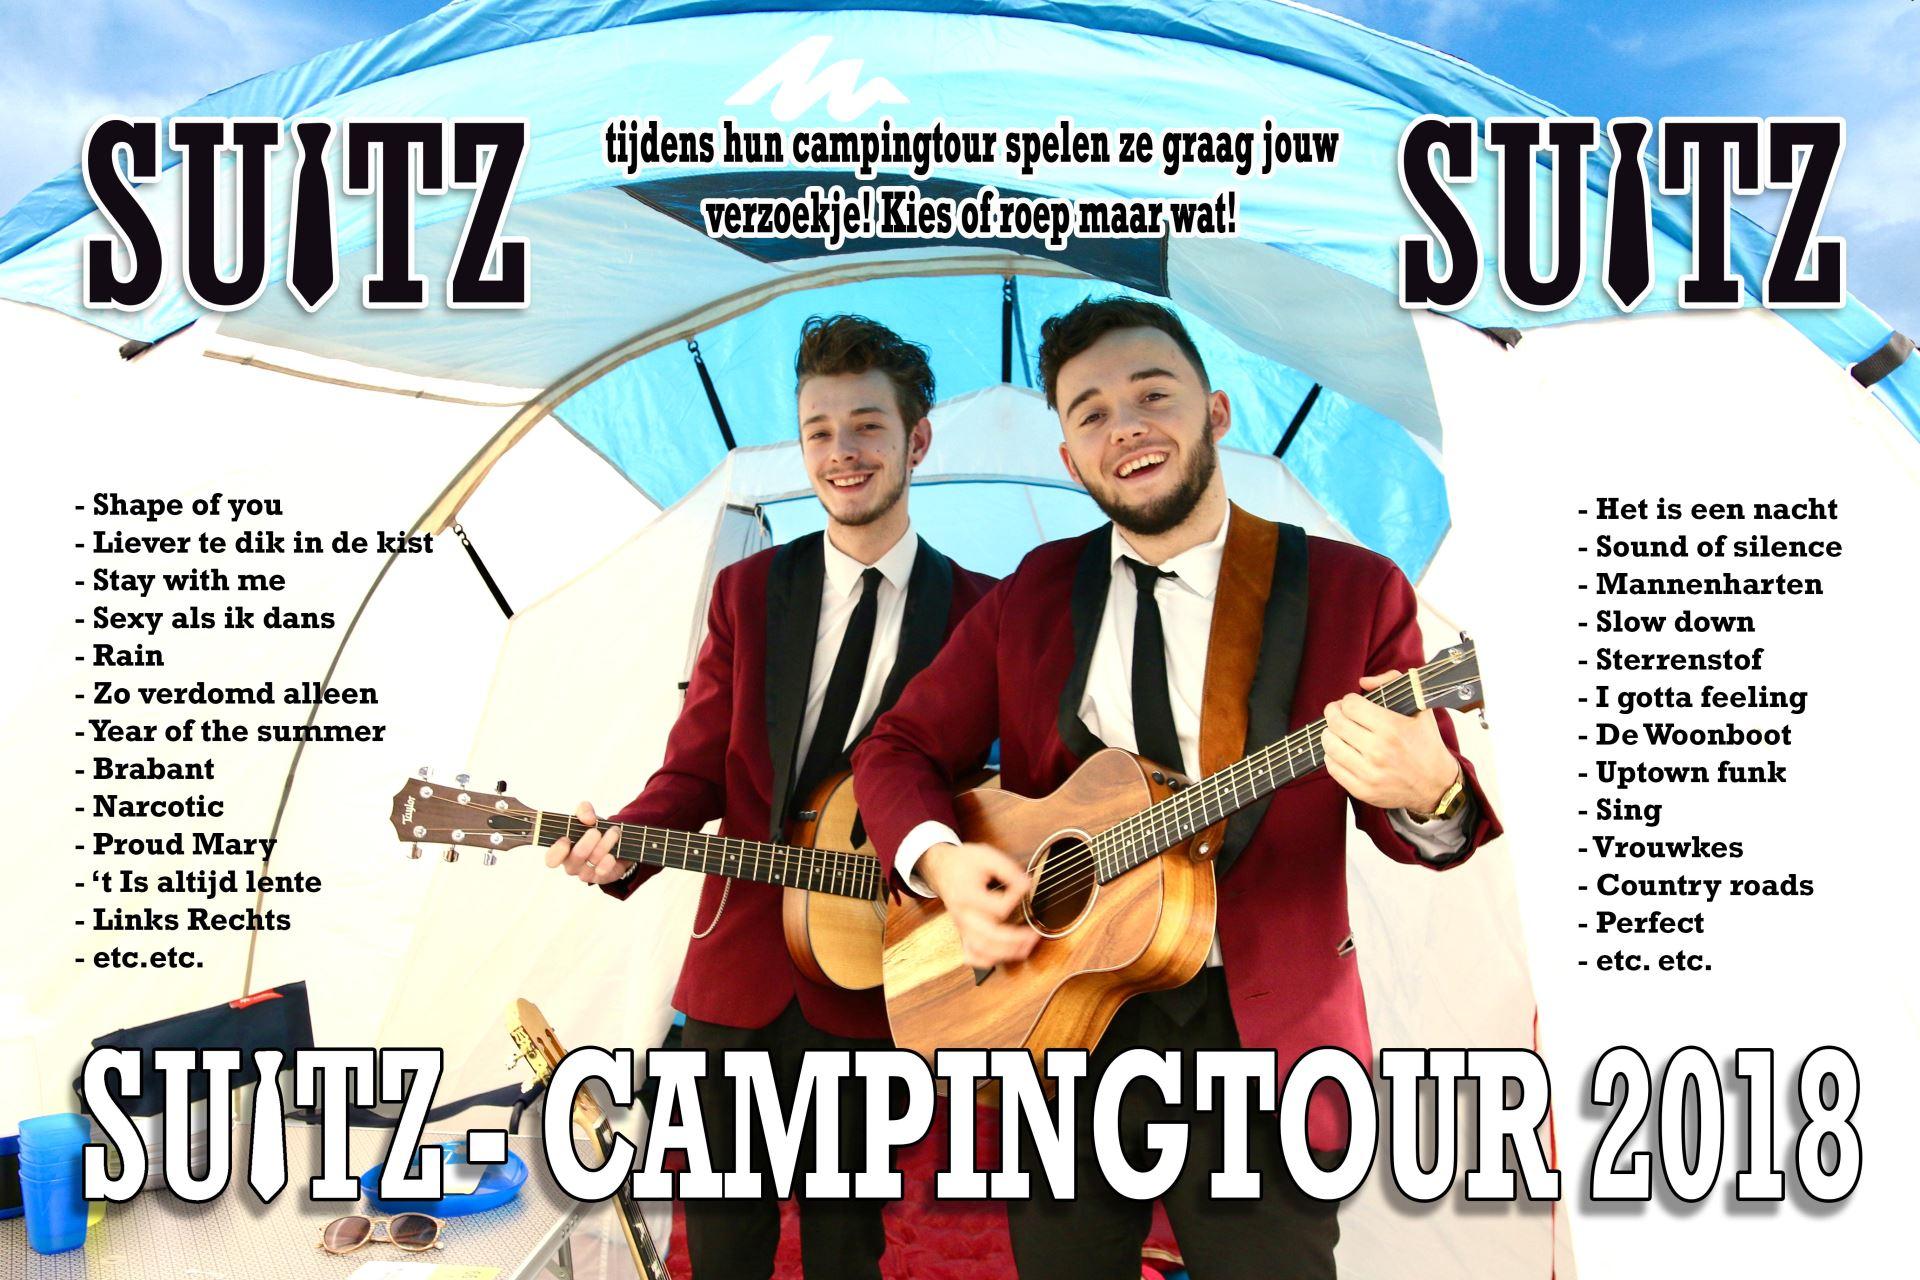 Suitz_Campingtour_2018